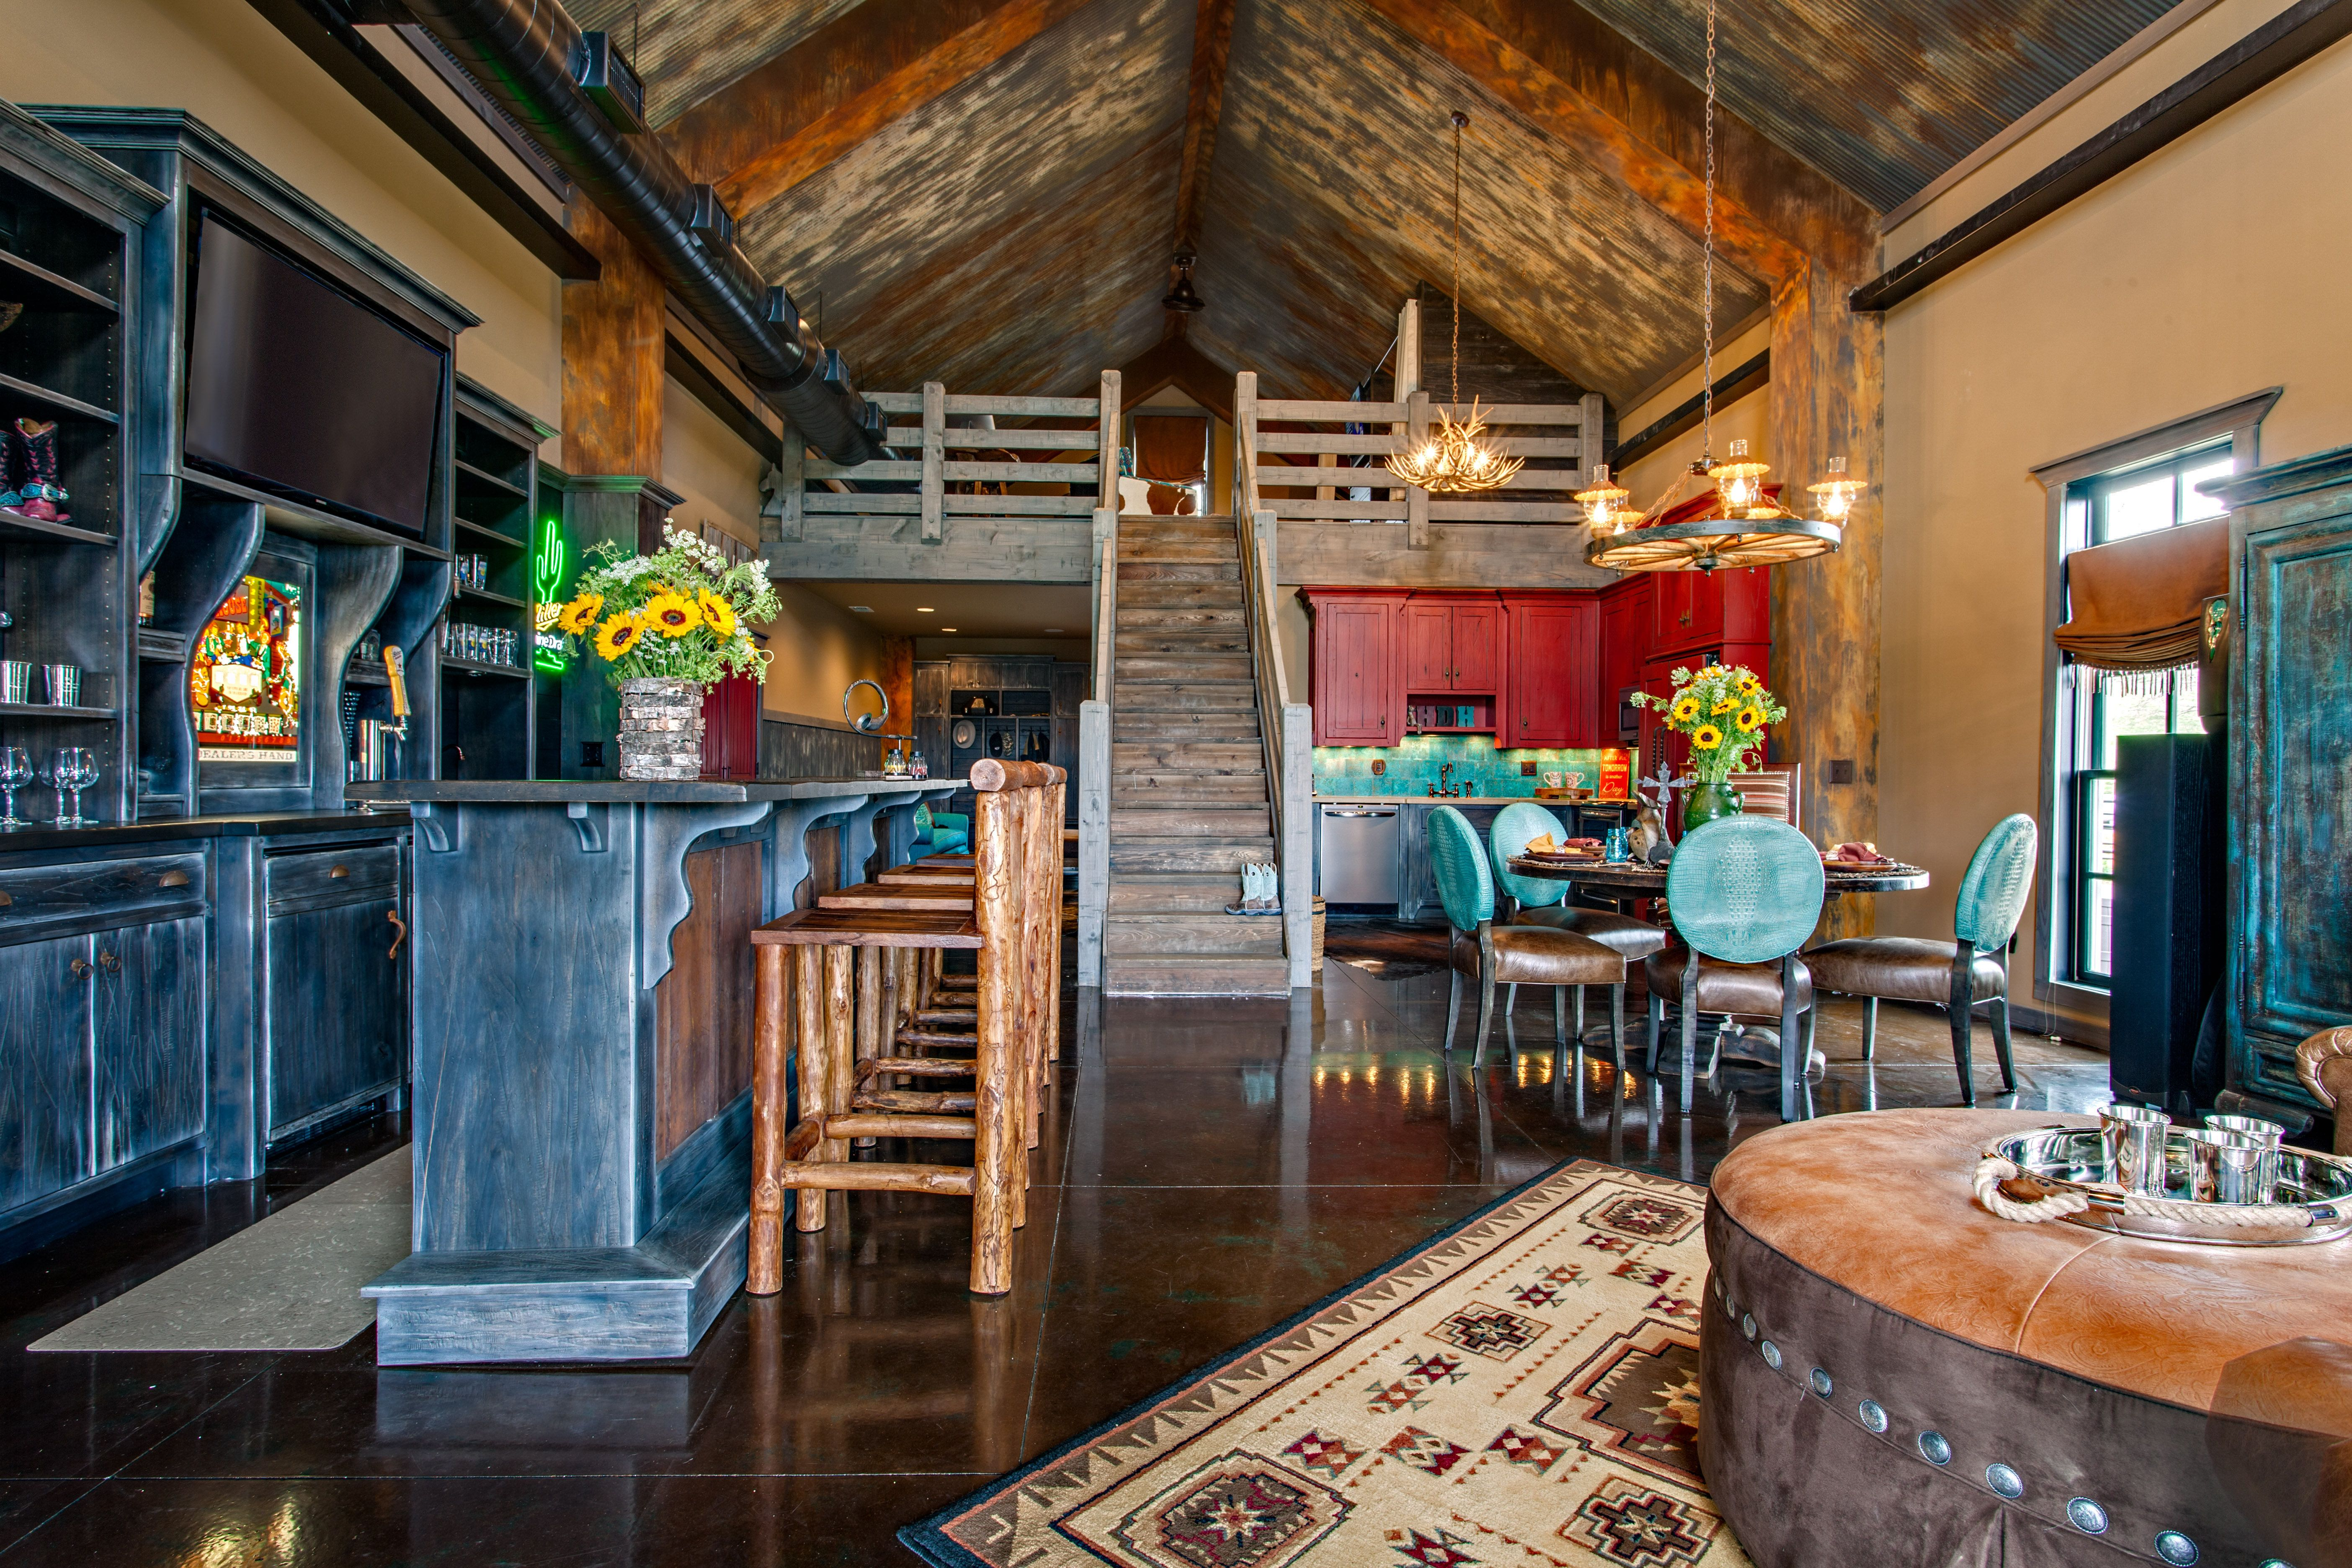 barn with living quarters Barn with living quarters